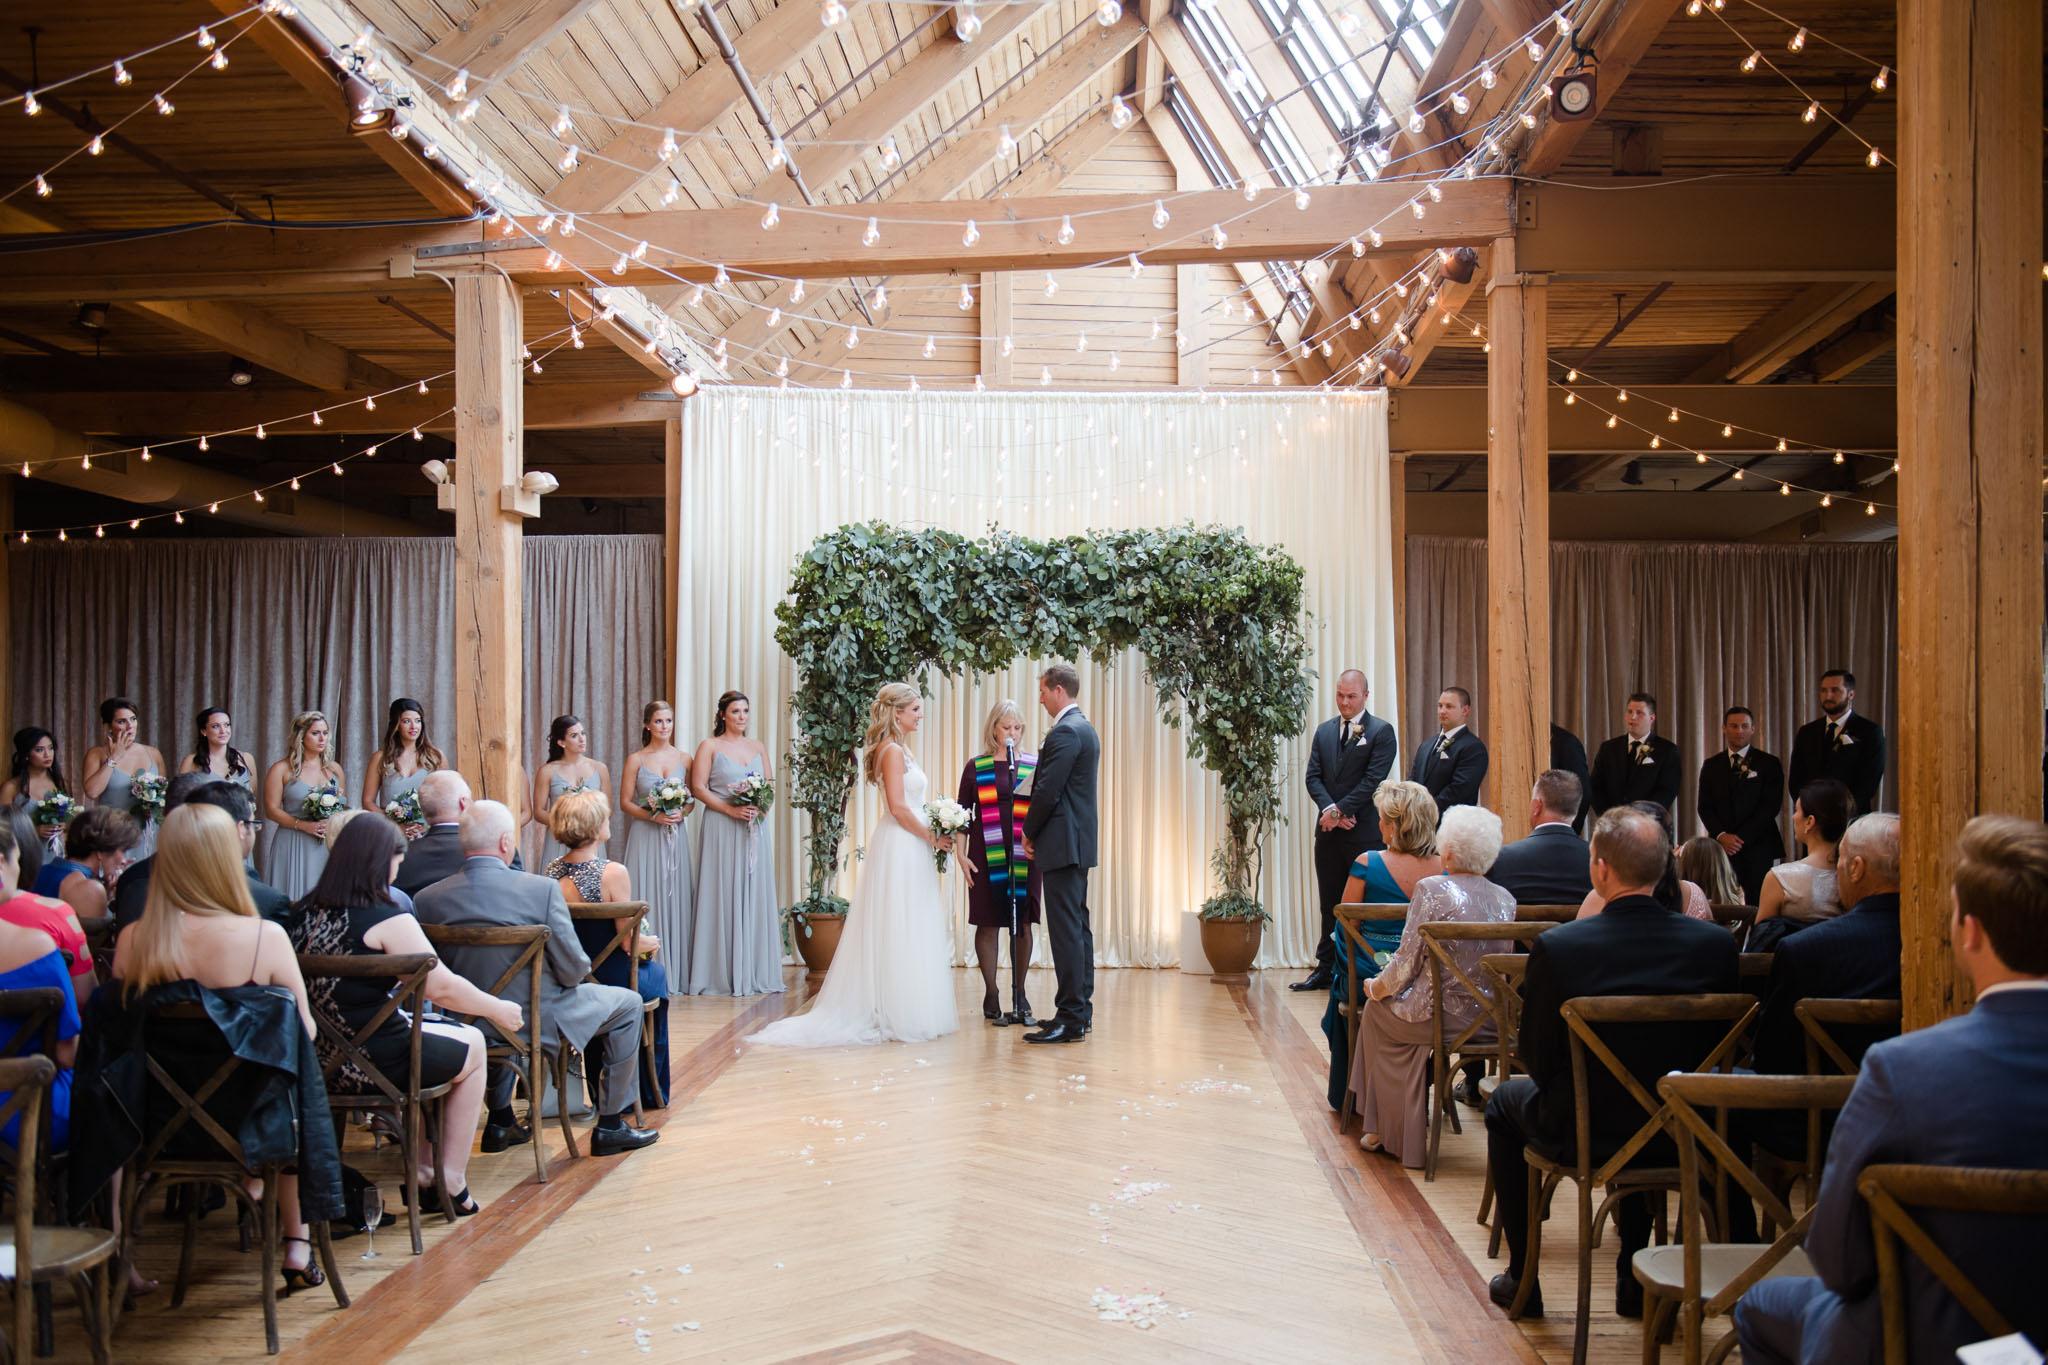 bridgeport-art-center-wedding-photos-23.jpg